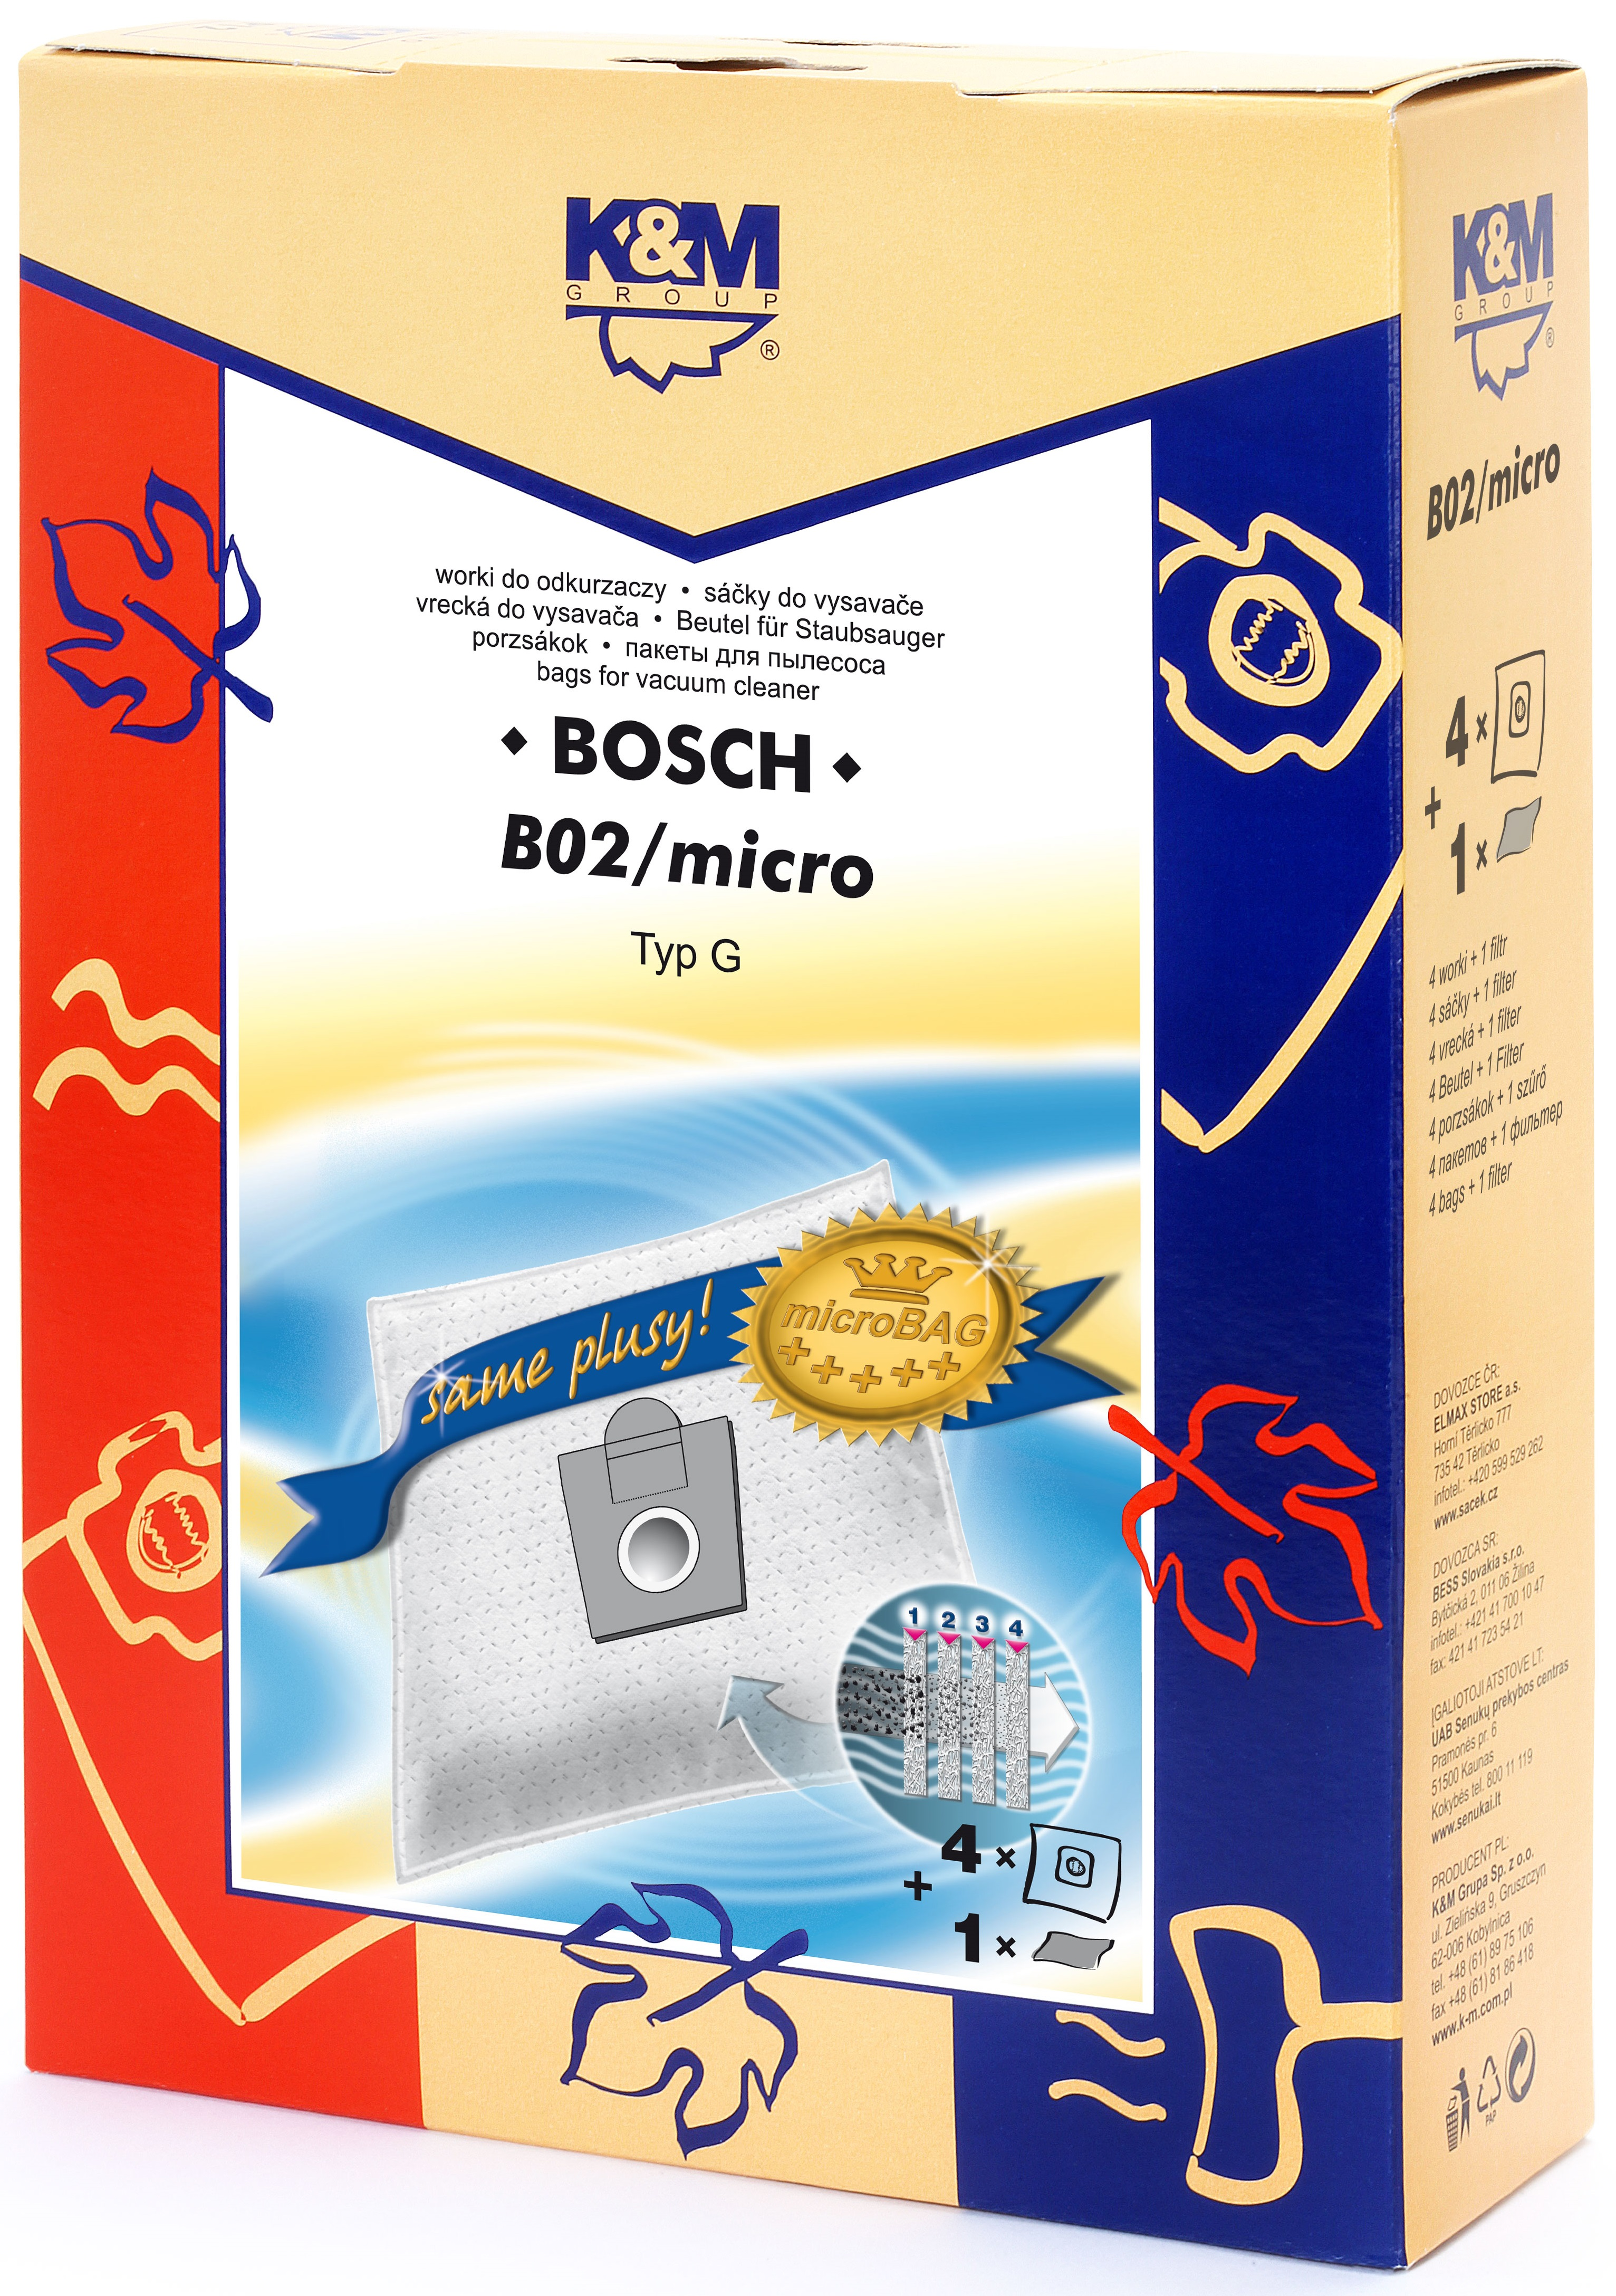 Sac aspirator pentru Bosch/Siemens typ E,D,G, sintetic, 4 saci + 1 filtru, K&M 0